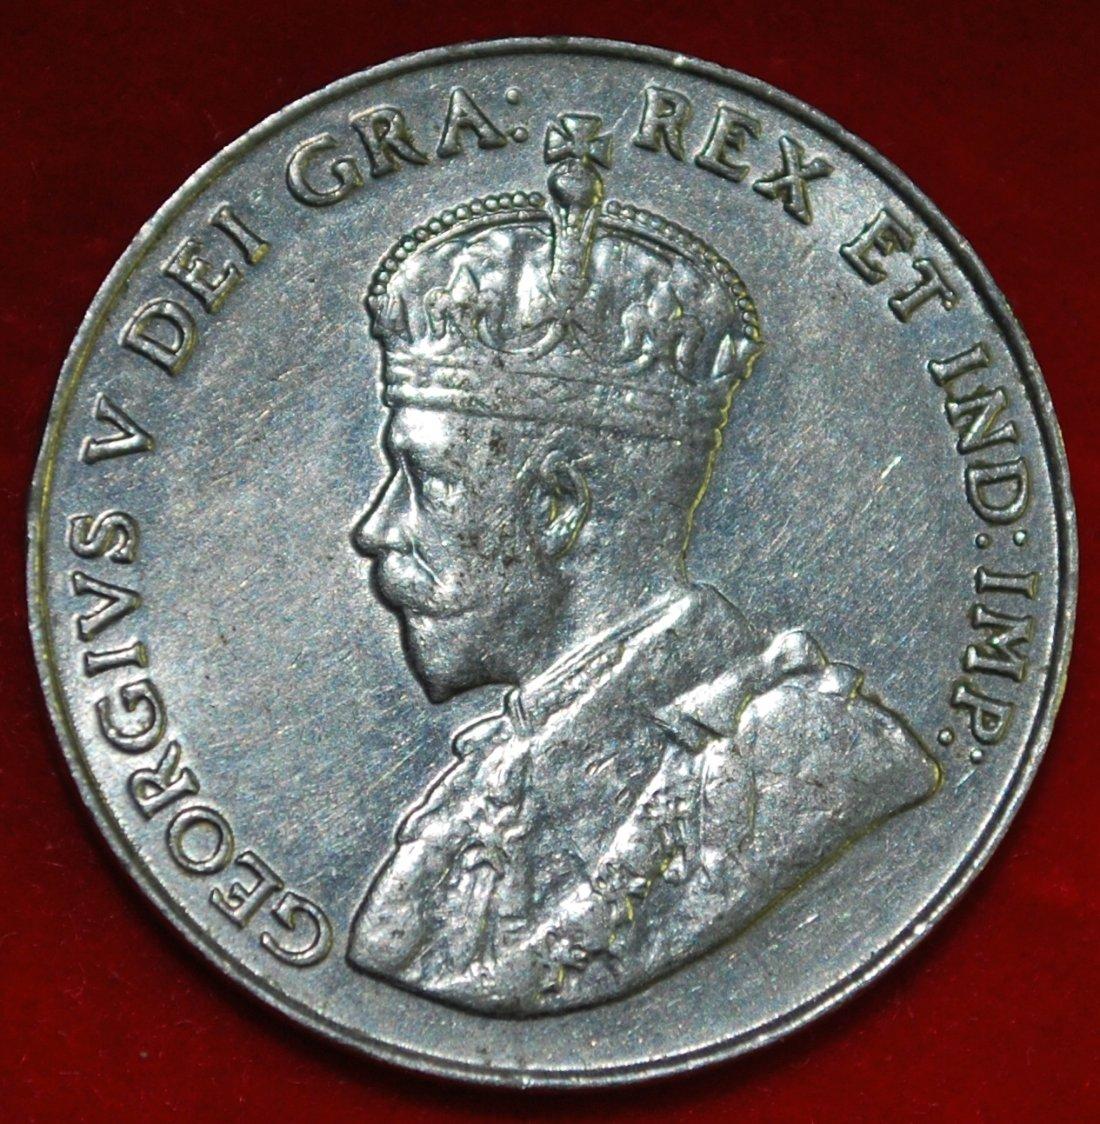 1926 nickel near grading please - Coin Community Forum